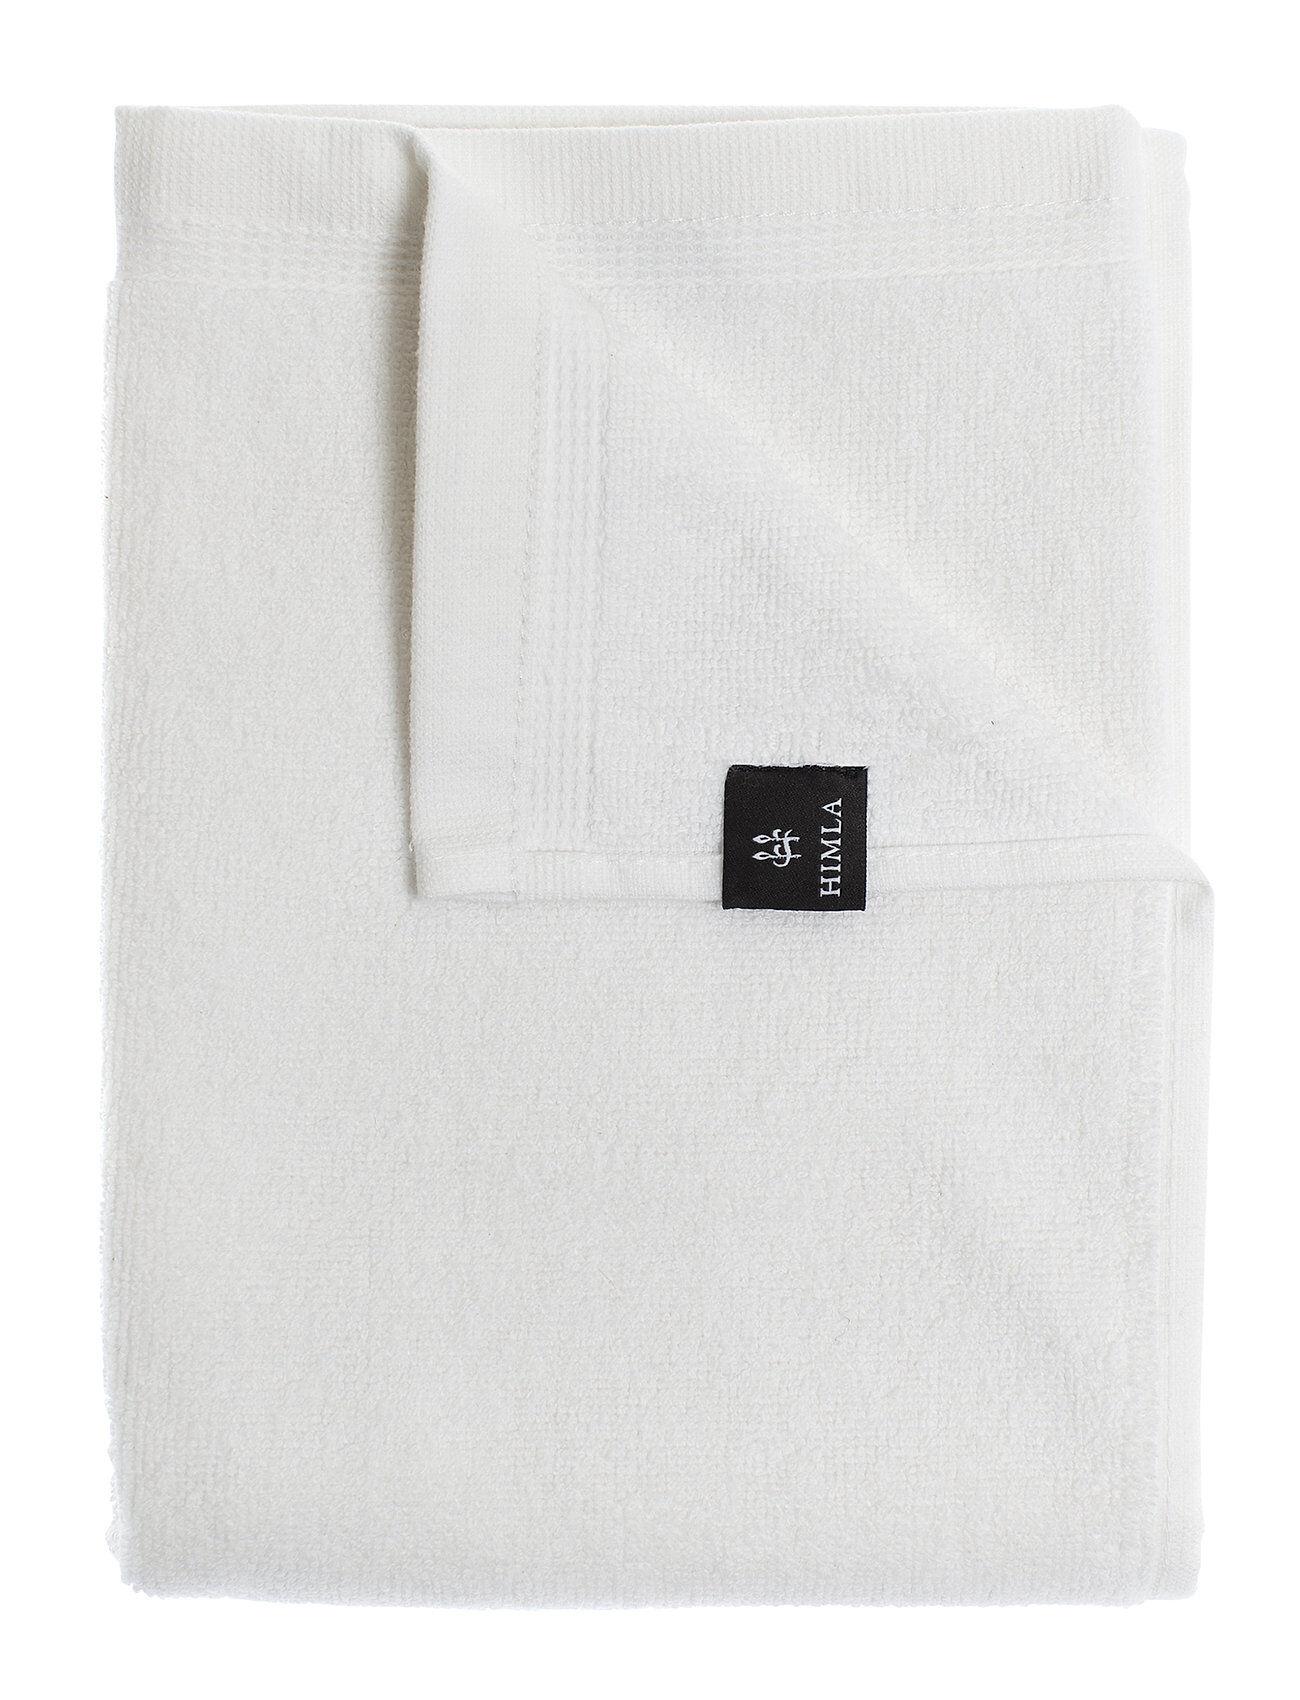 Himla Lina Towel Home Bathroom Towels Valkoinen Himla